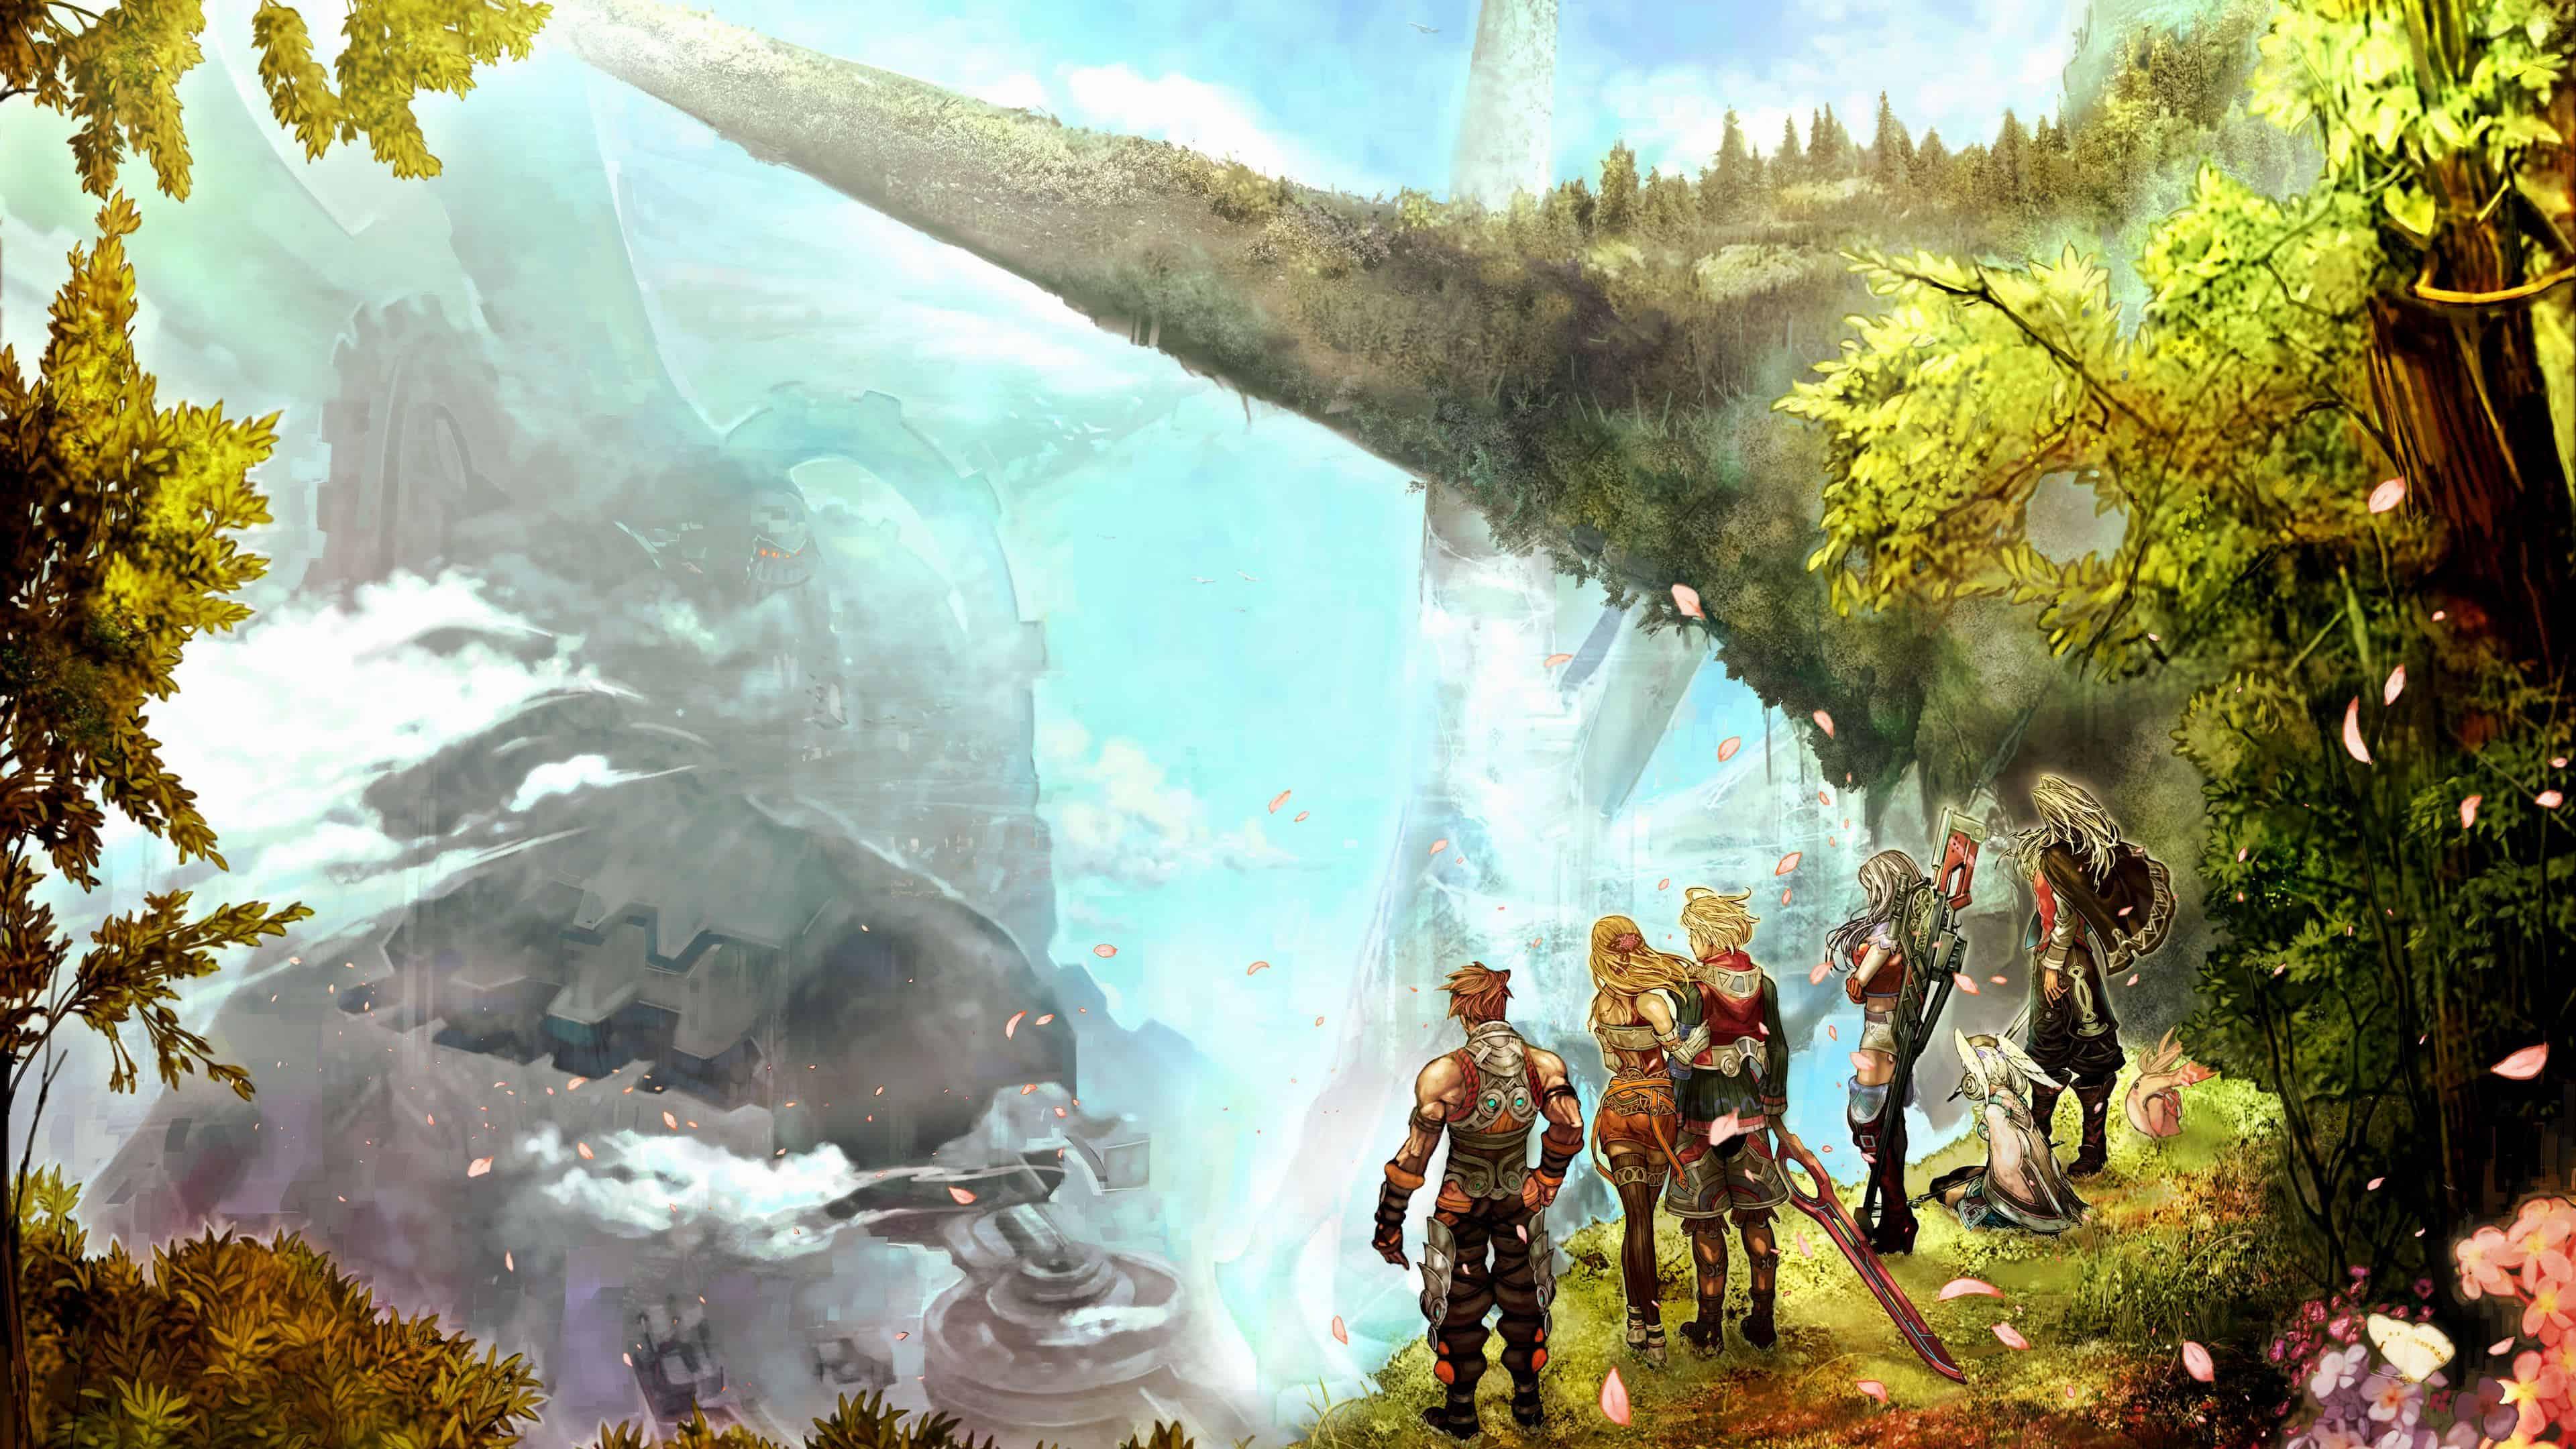 Xenoblade Chronicles UHD 4K Wallpaper